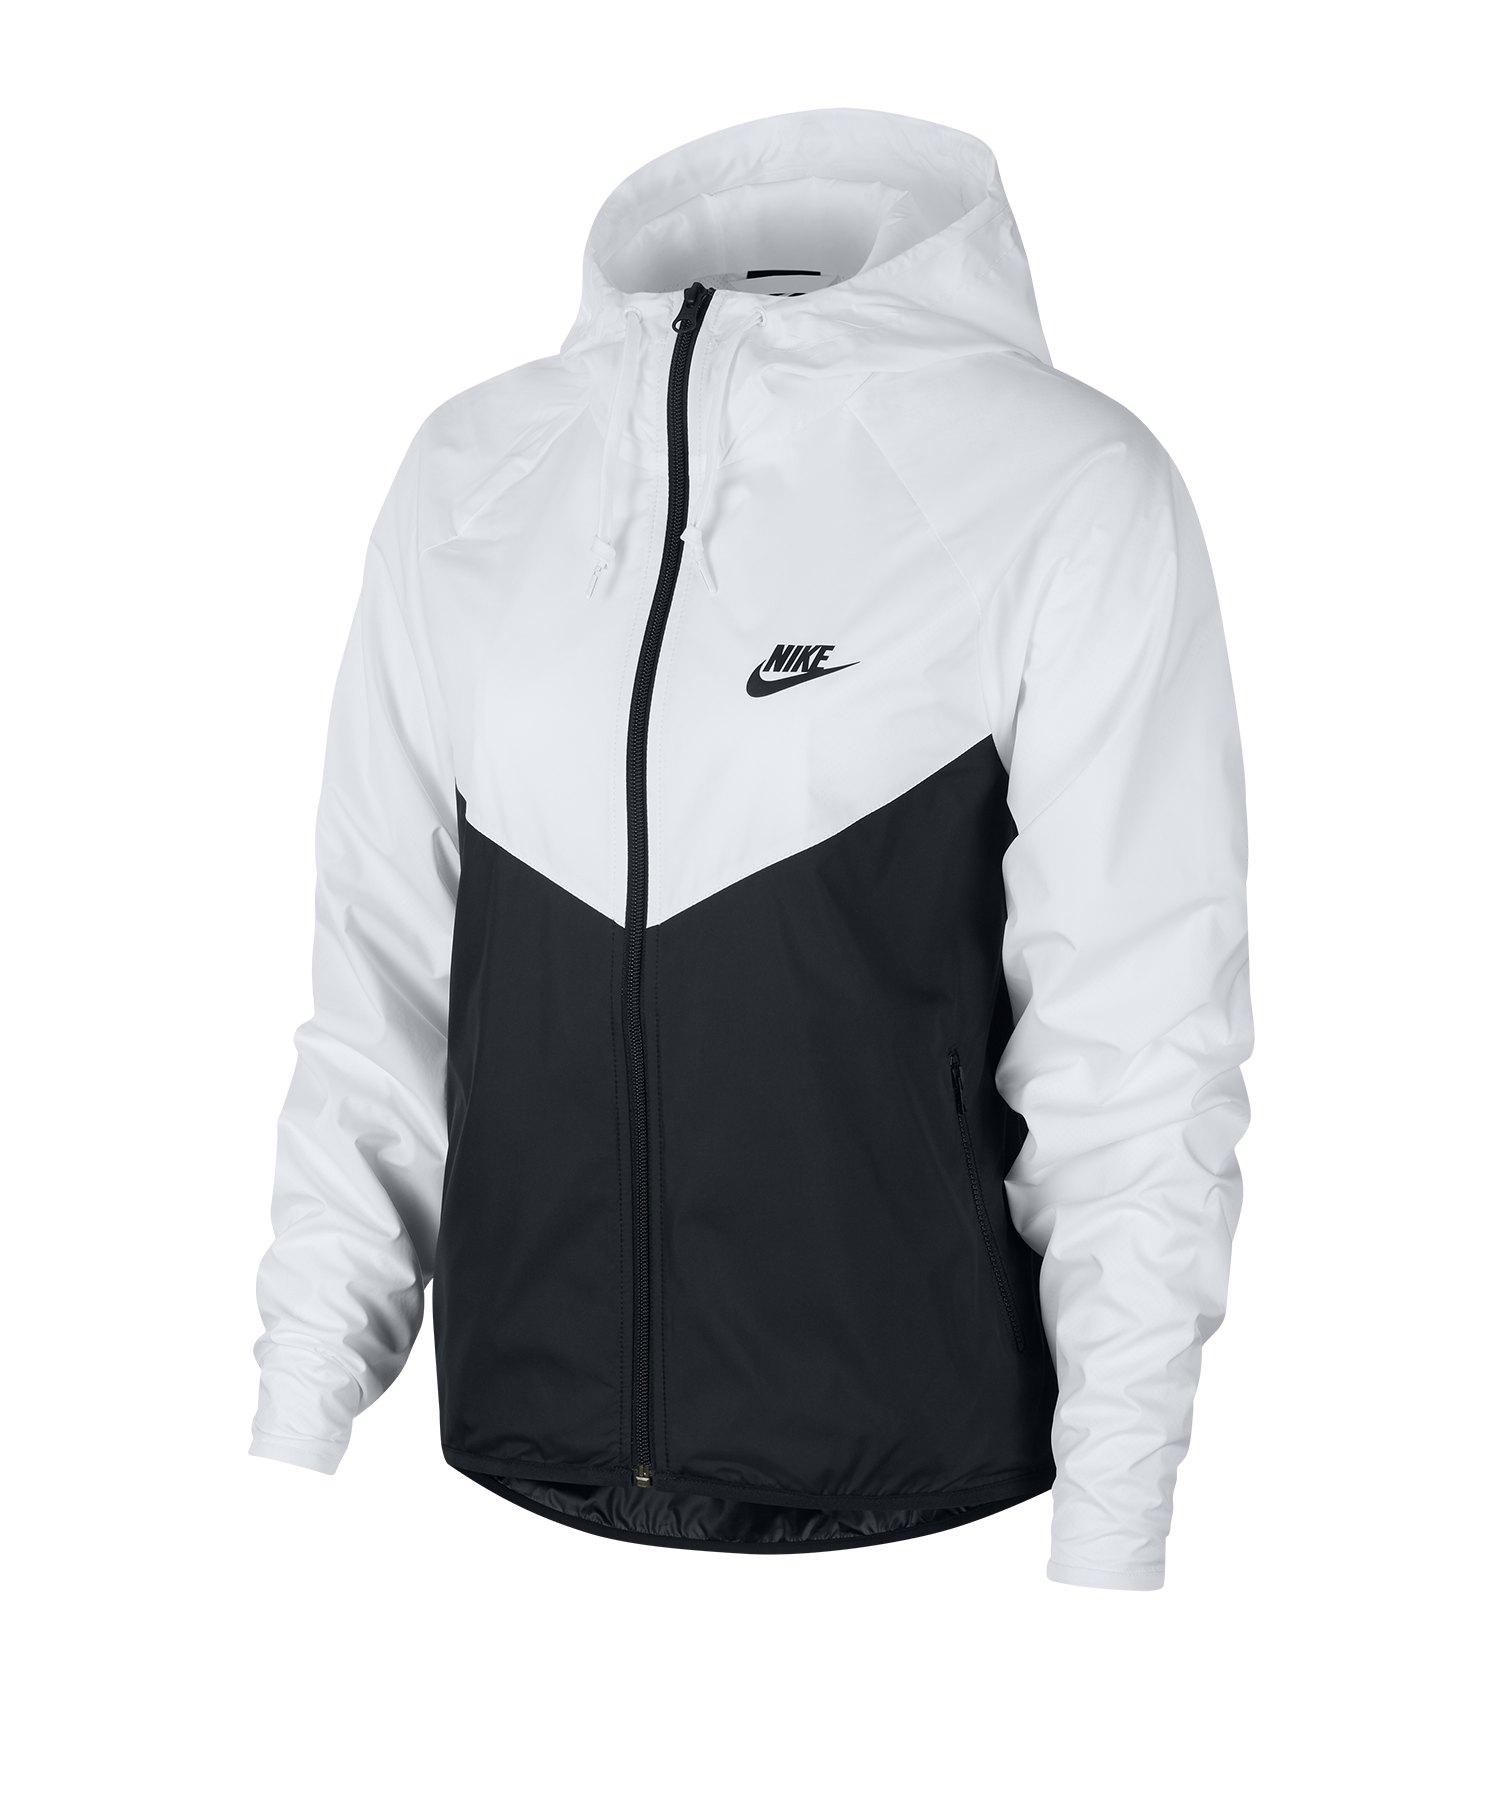 Nike Windrunner Jacke Damen Weiss F101 - weiss